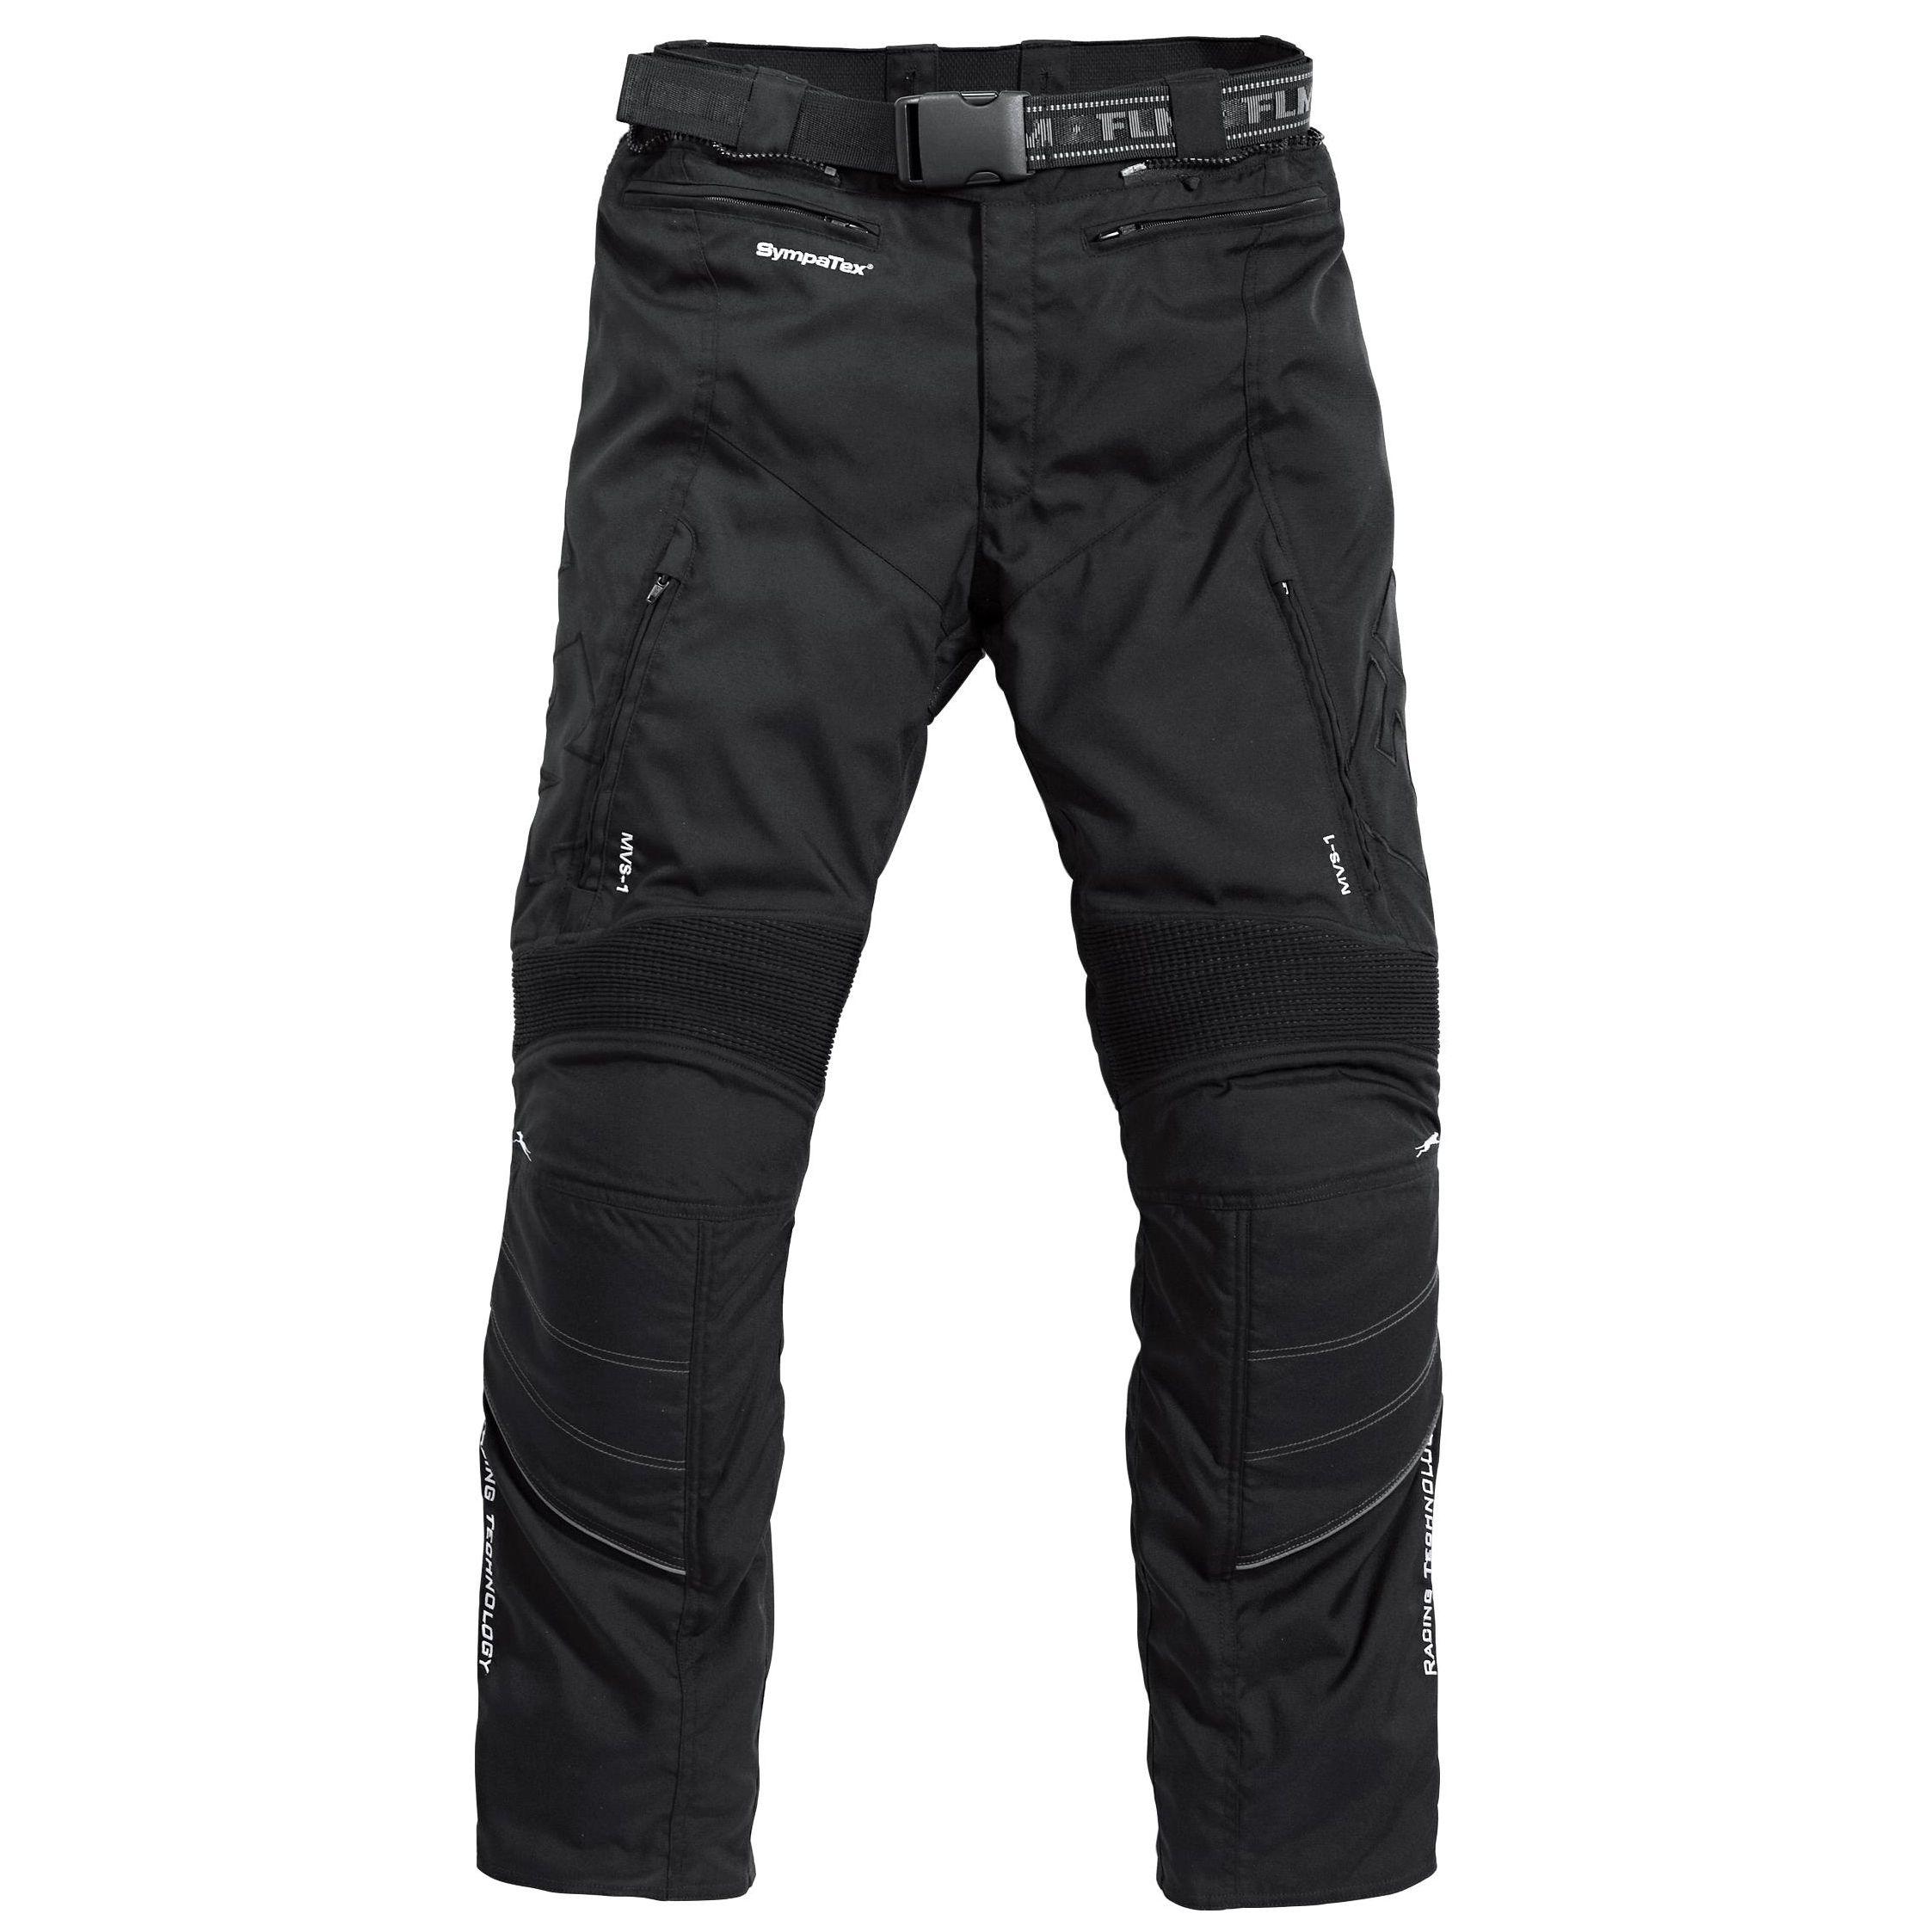 Pantalon Flm Sport 2.0